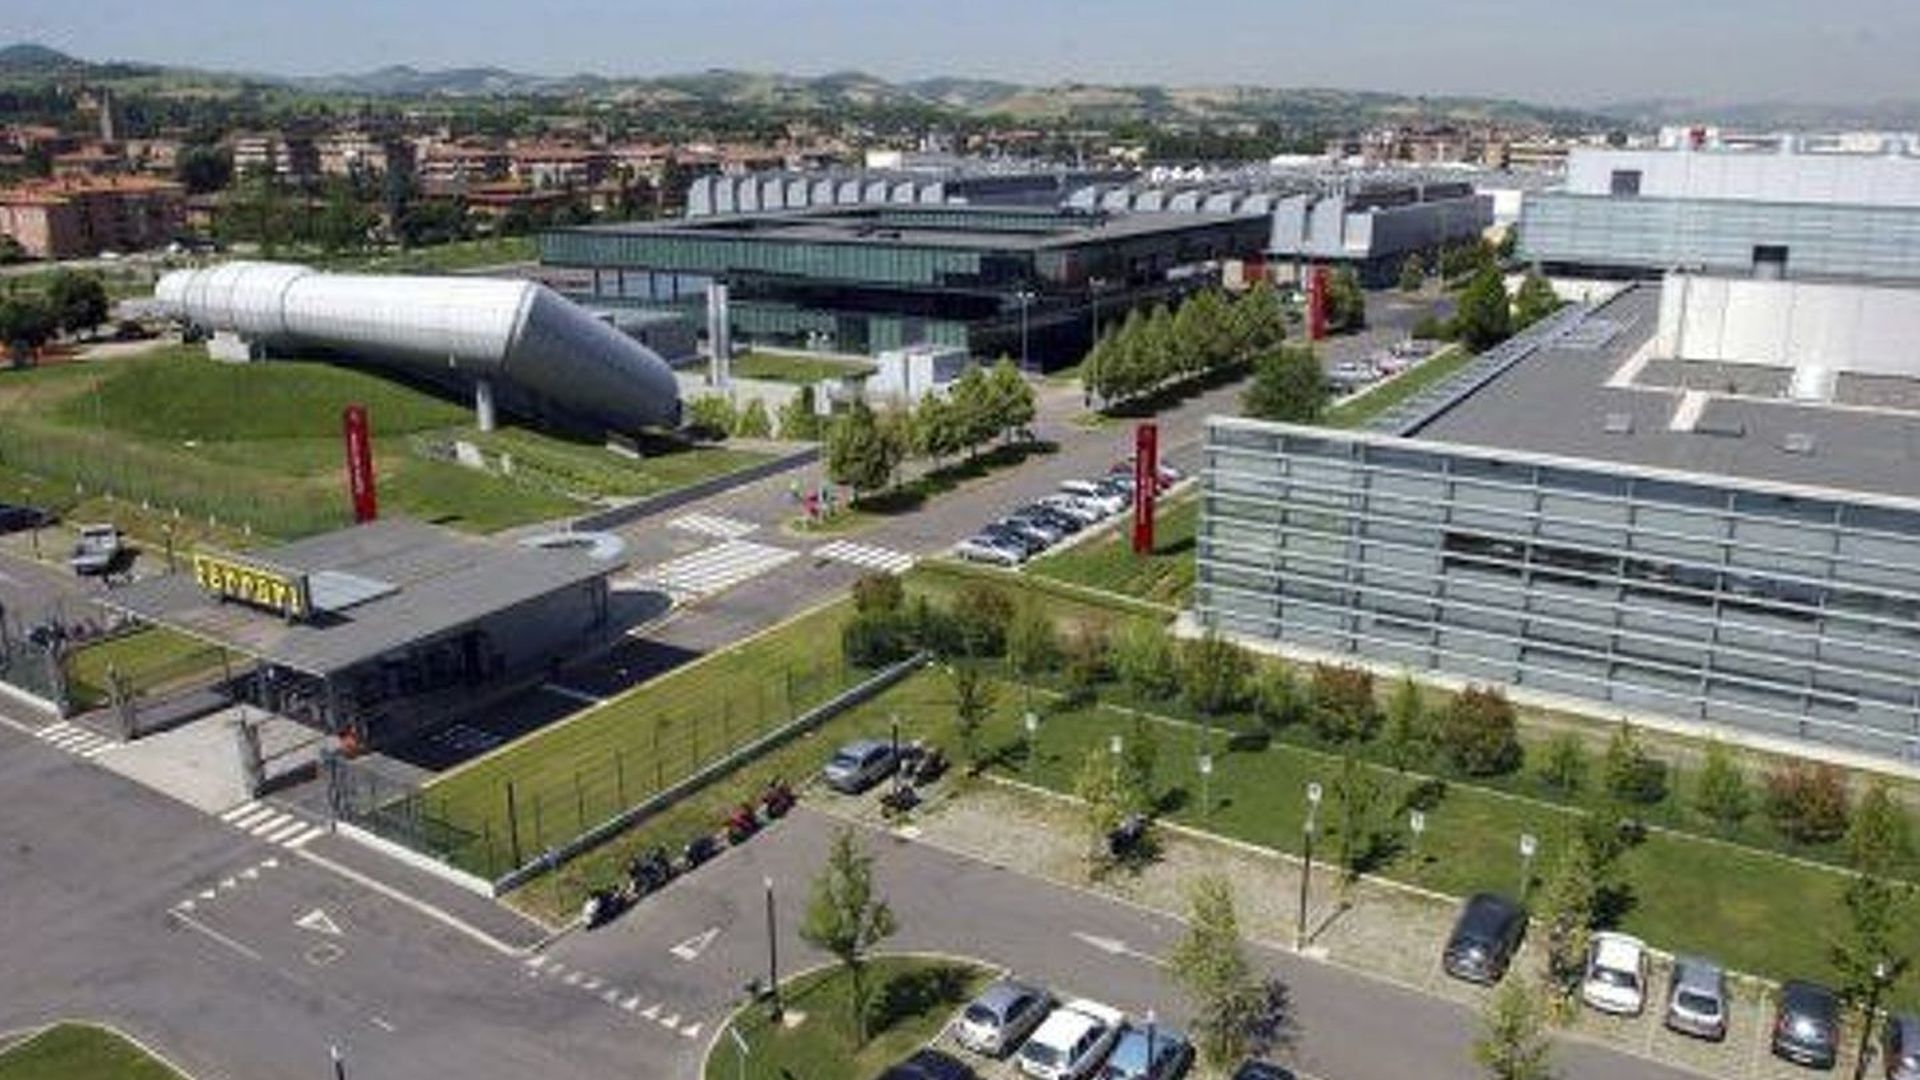 Ferrari: Best Place to Work in Europe